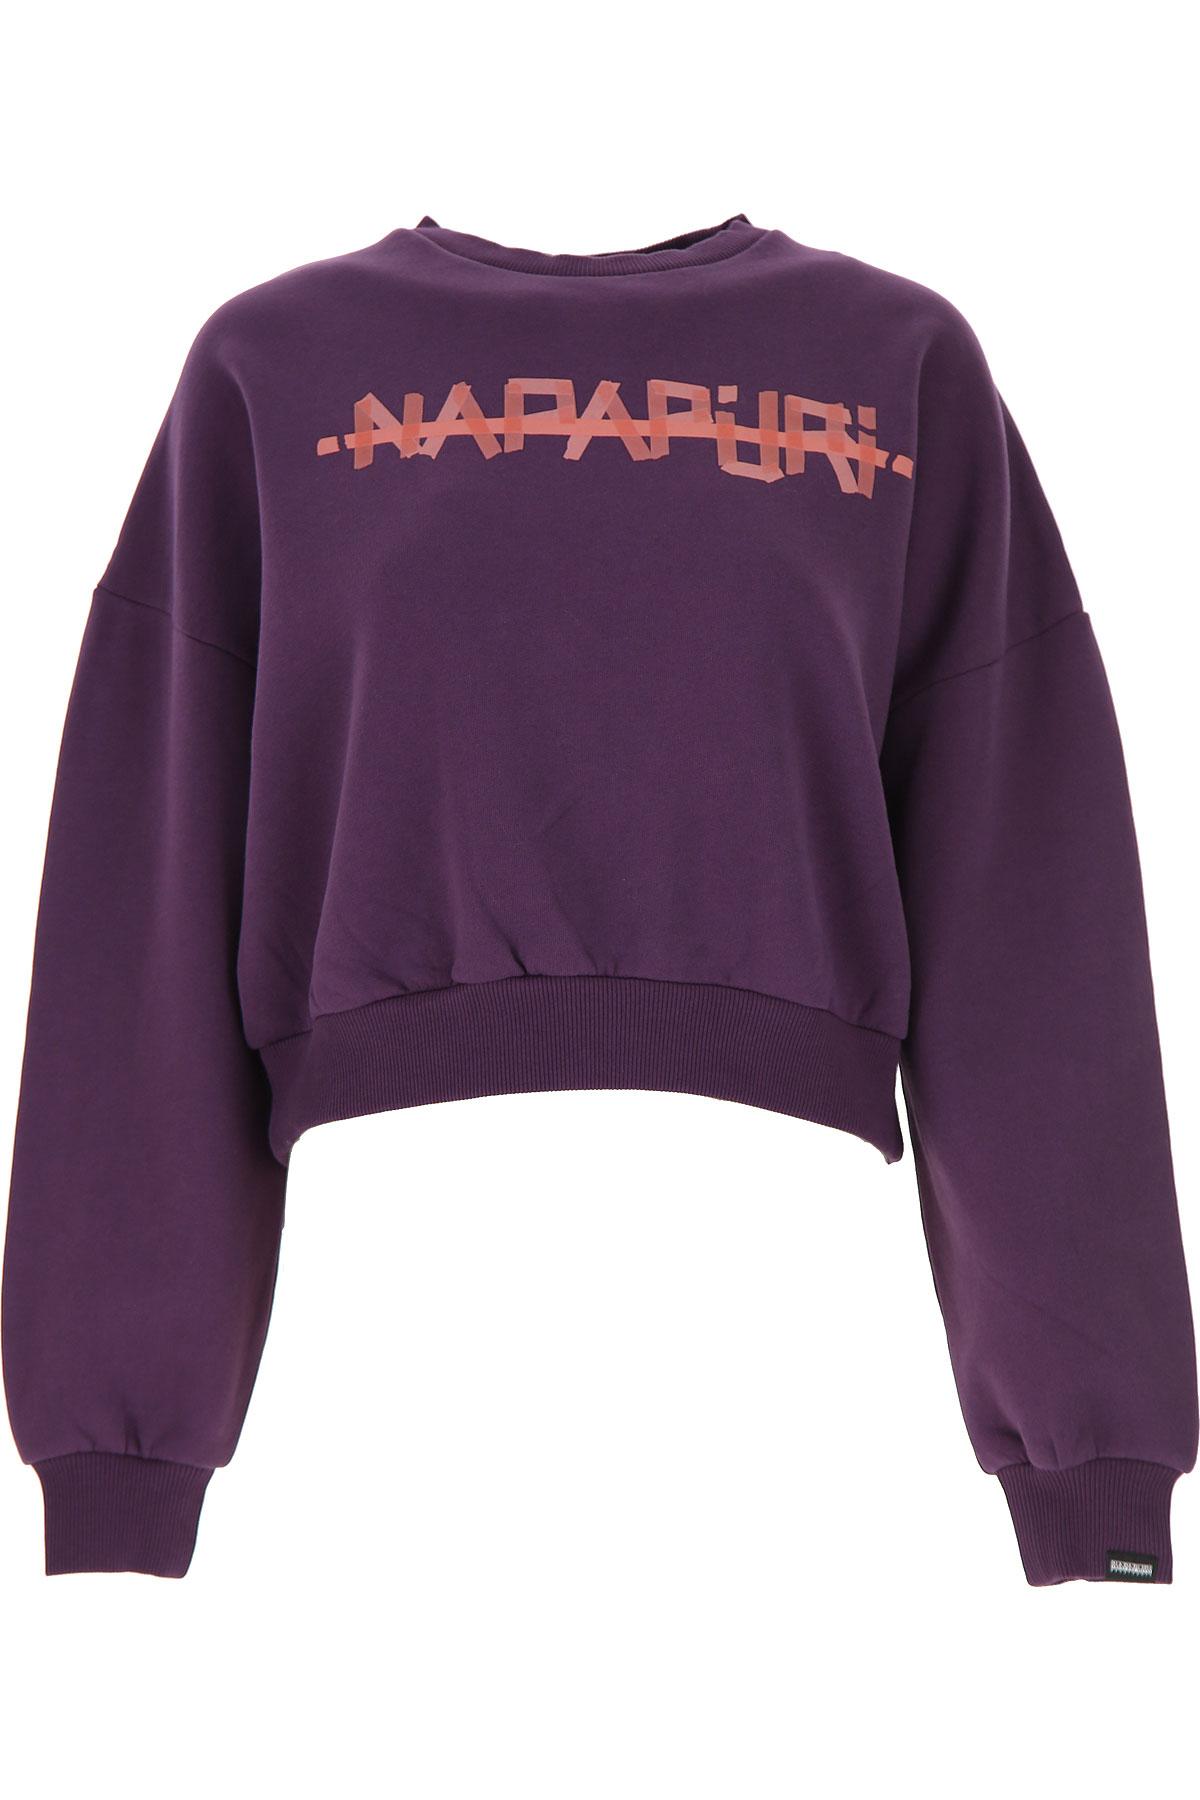 Napapijri Sweater for Women Jumper On Sale, Purple, Cotton, 2019, 2 4